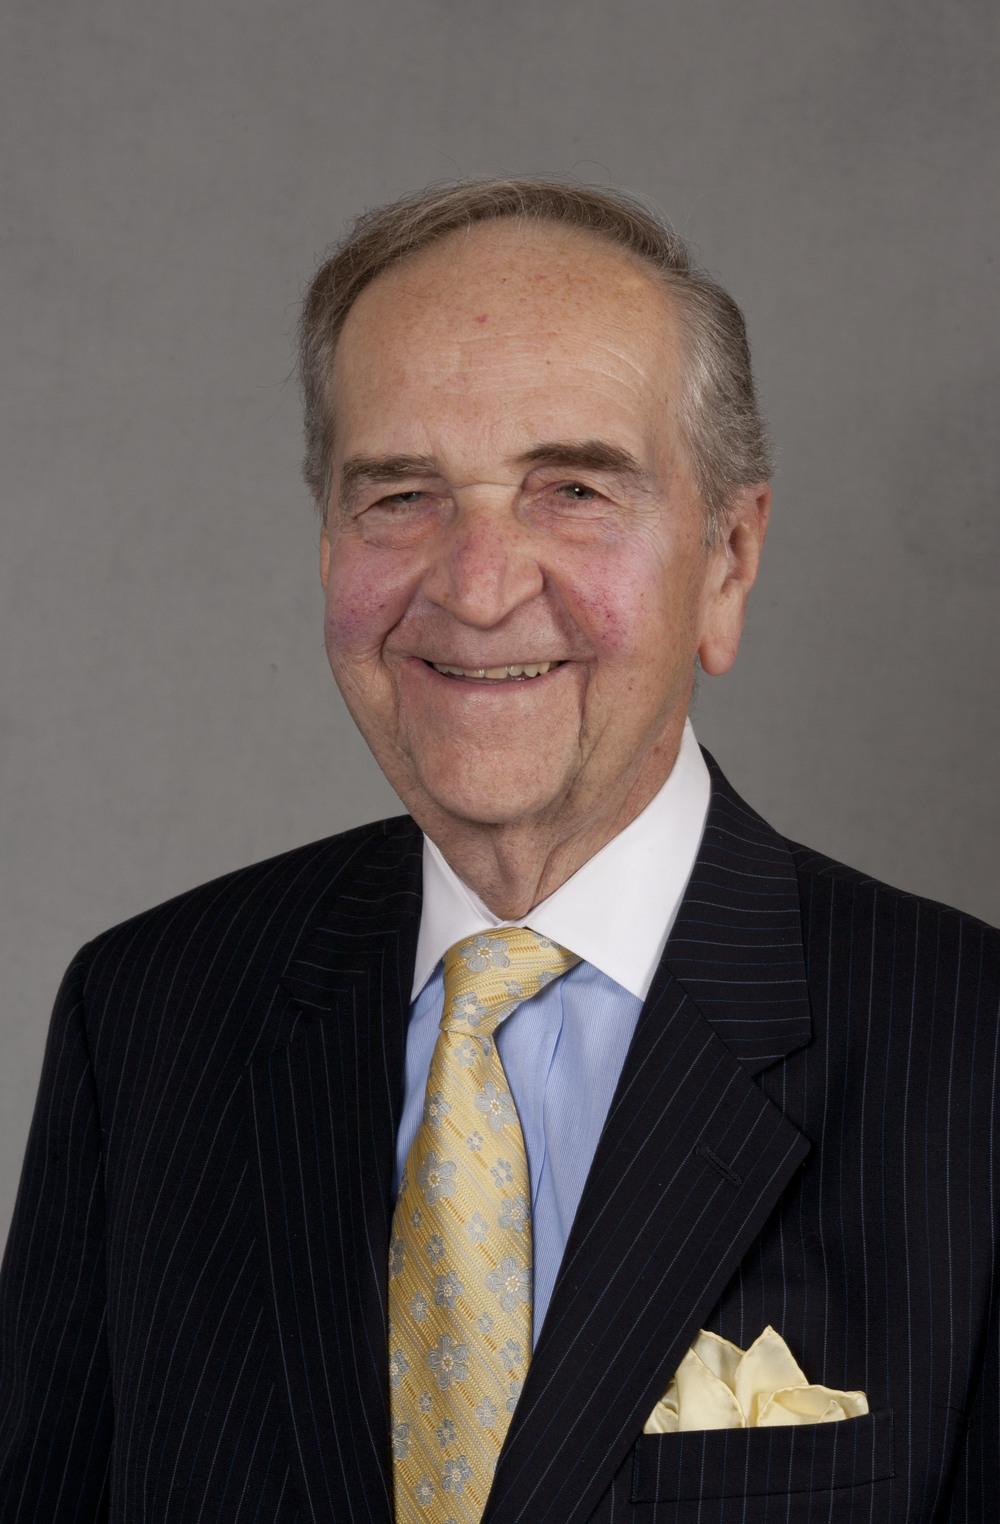 Michael Brescia, M.D.—Executive Medical Director, Calvary Hospital Photo: Courtesy of Calvary Hospital